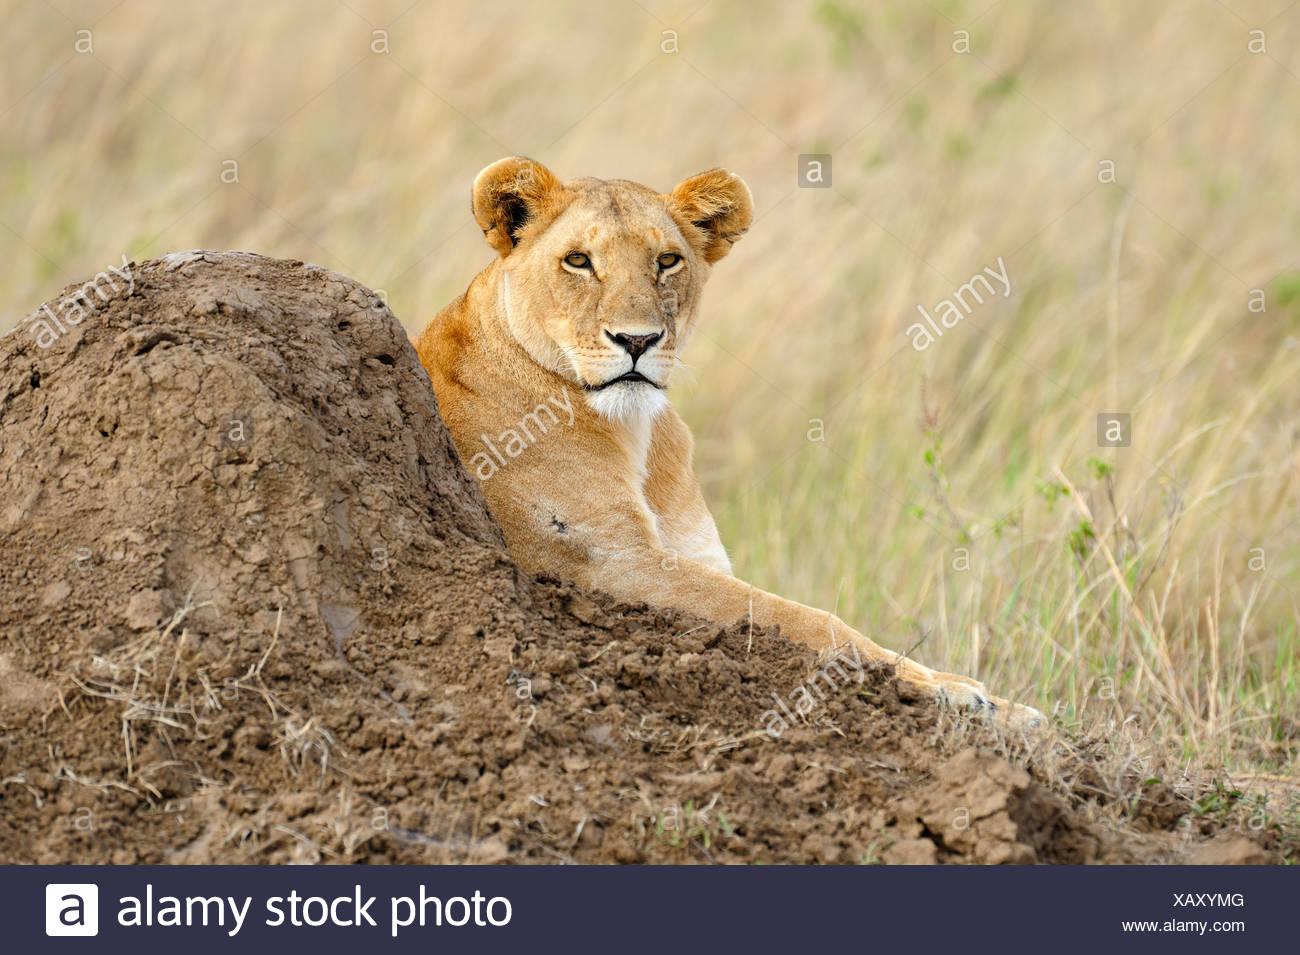 León (Panthera leo), hembra descansando en un termitero, Reserva Nacional de Masai Mara, Kenya, Africa. Imagen De Stock